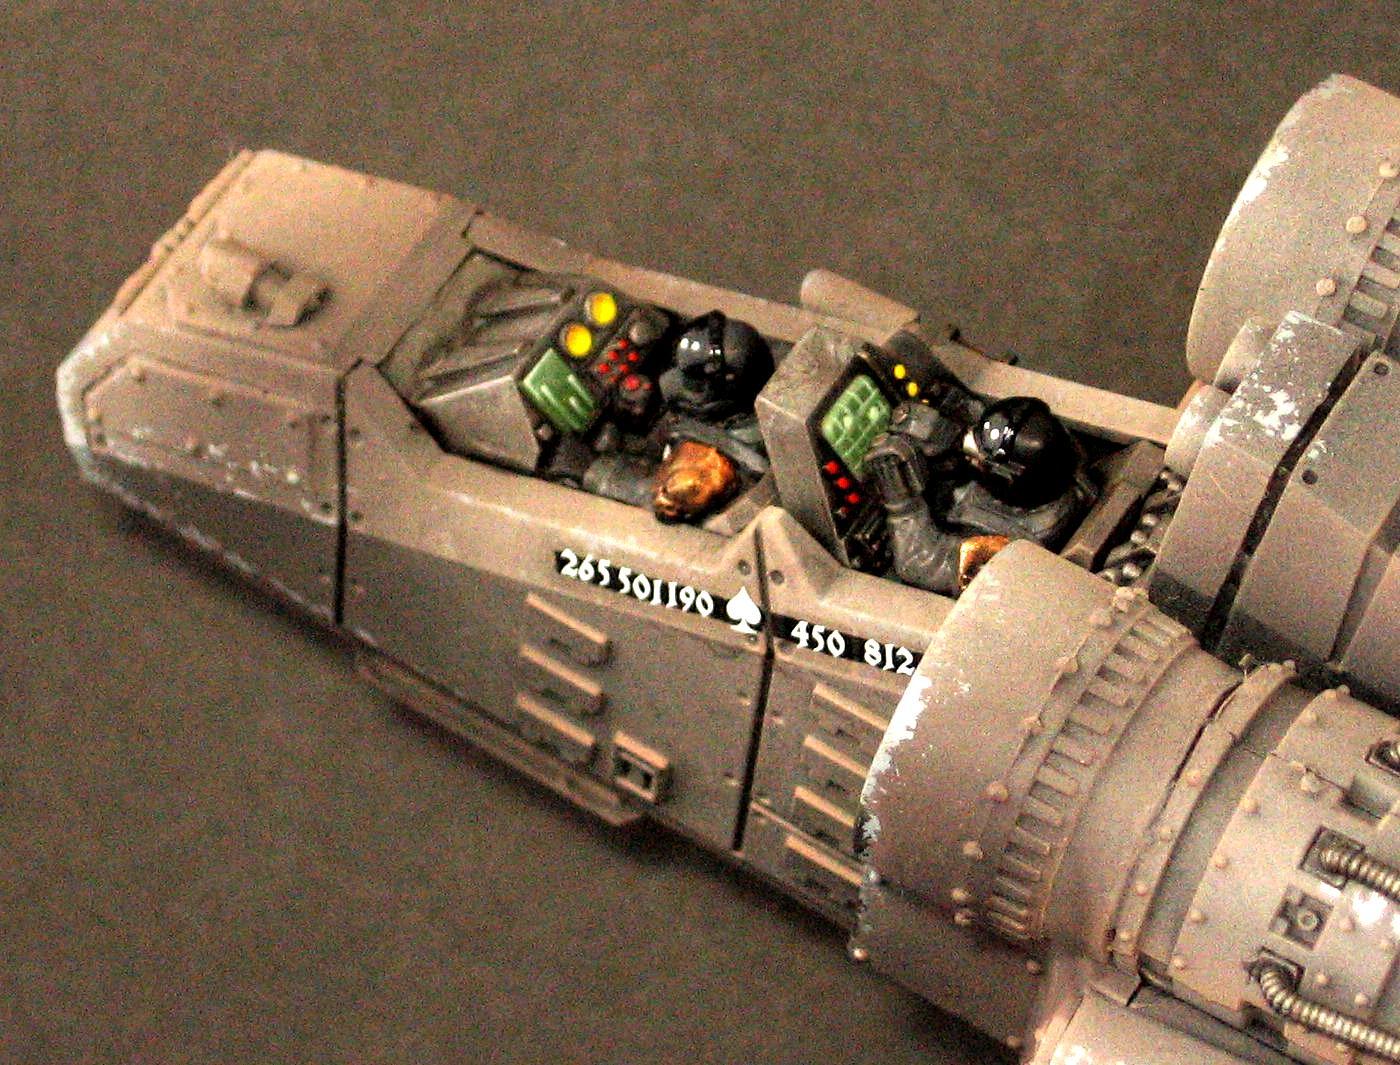 Flyer, Imperial Guard, Valkyrie, Vendetta, Warhammer 40,000, Warhammer Fantasy